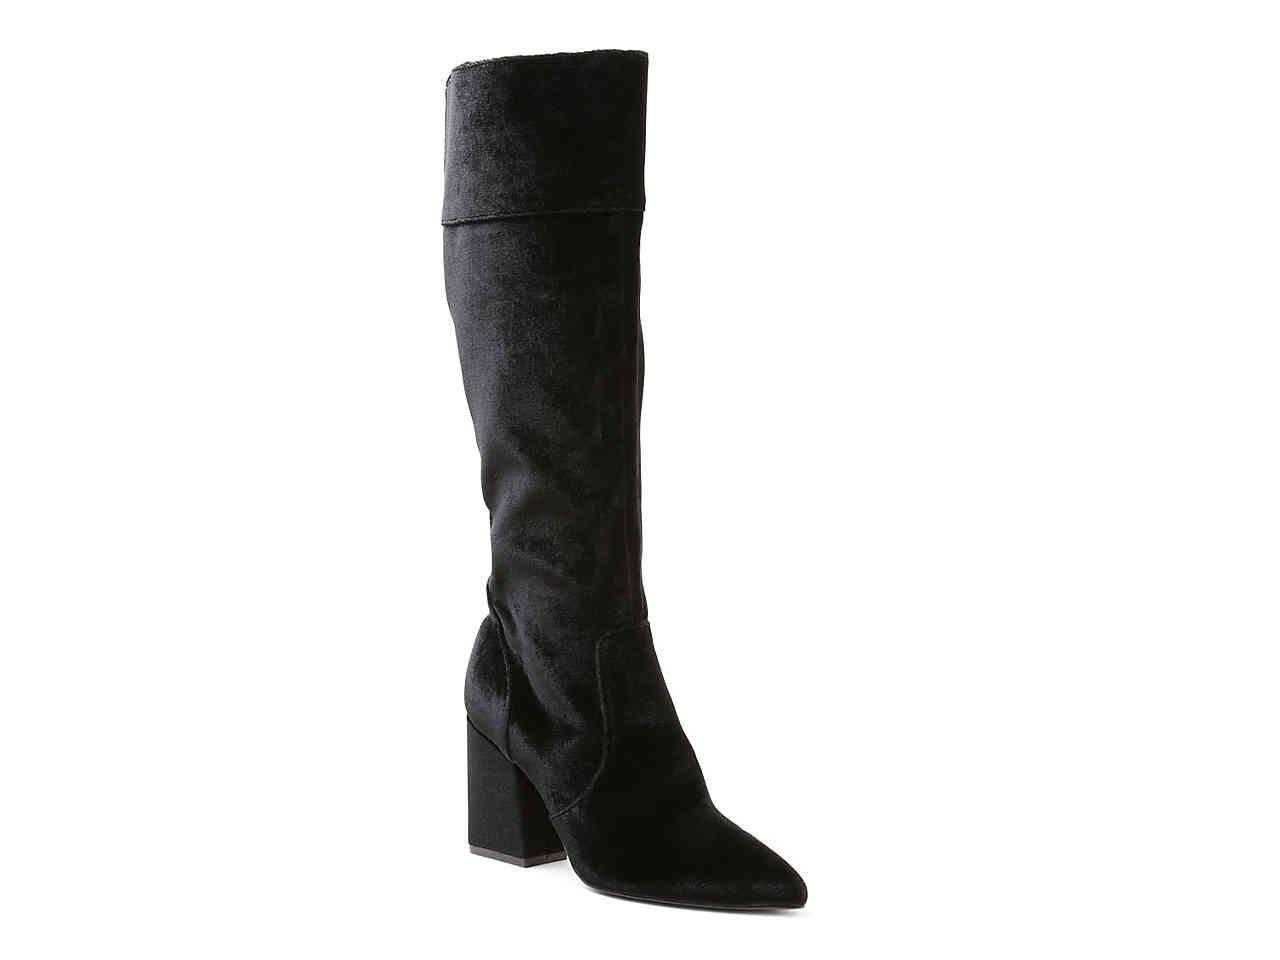 Kensie Talbert Knee High Boot (Women's) 7tzEBi1